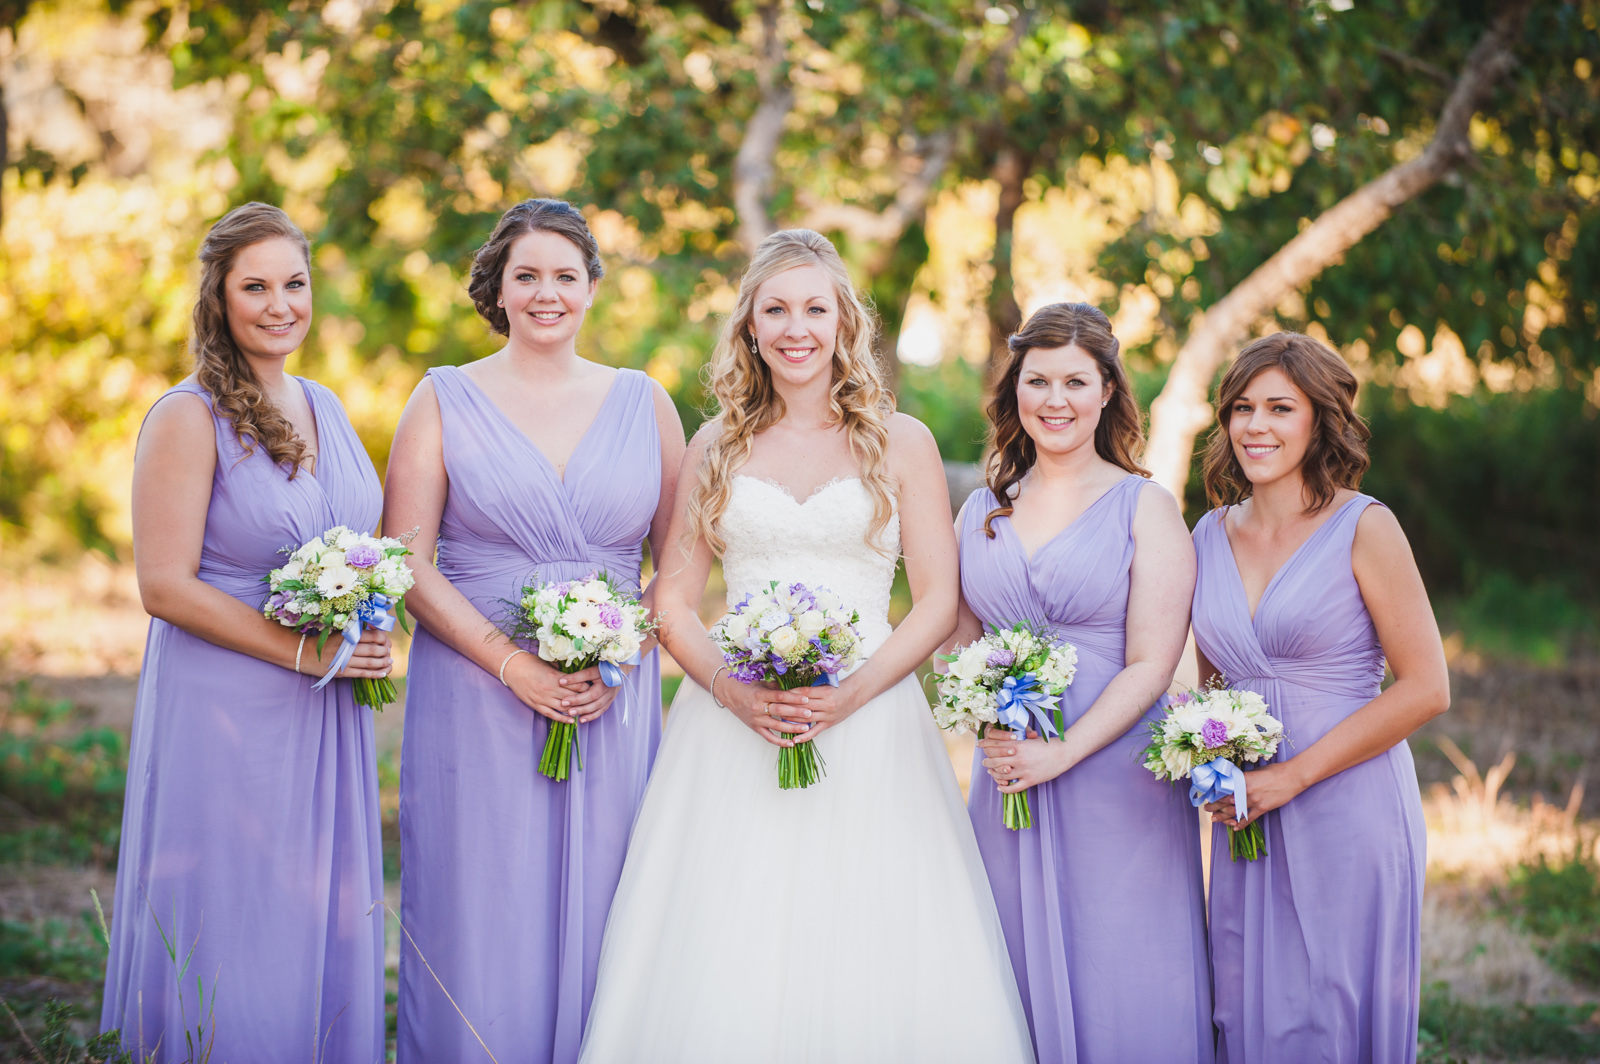 victoria-wedding-photographers-royal-colwood-golf-course-wedding-30.jpg